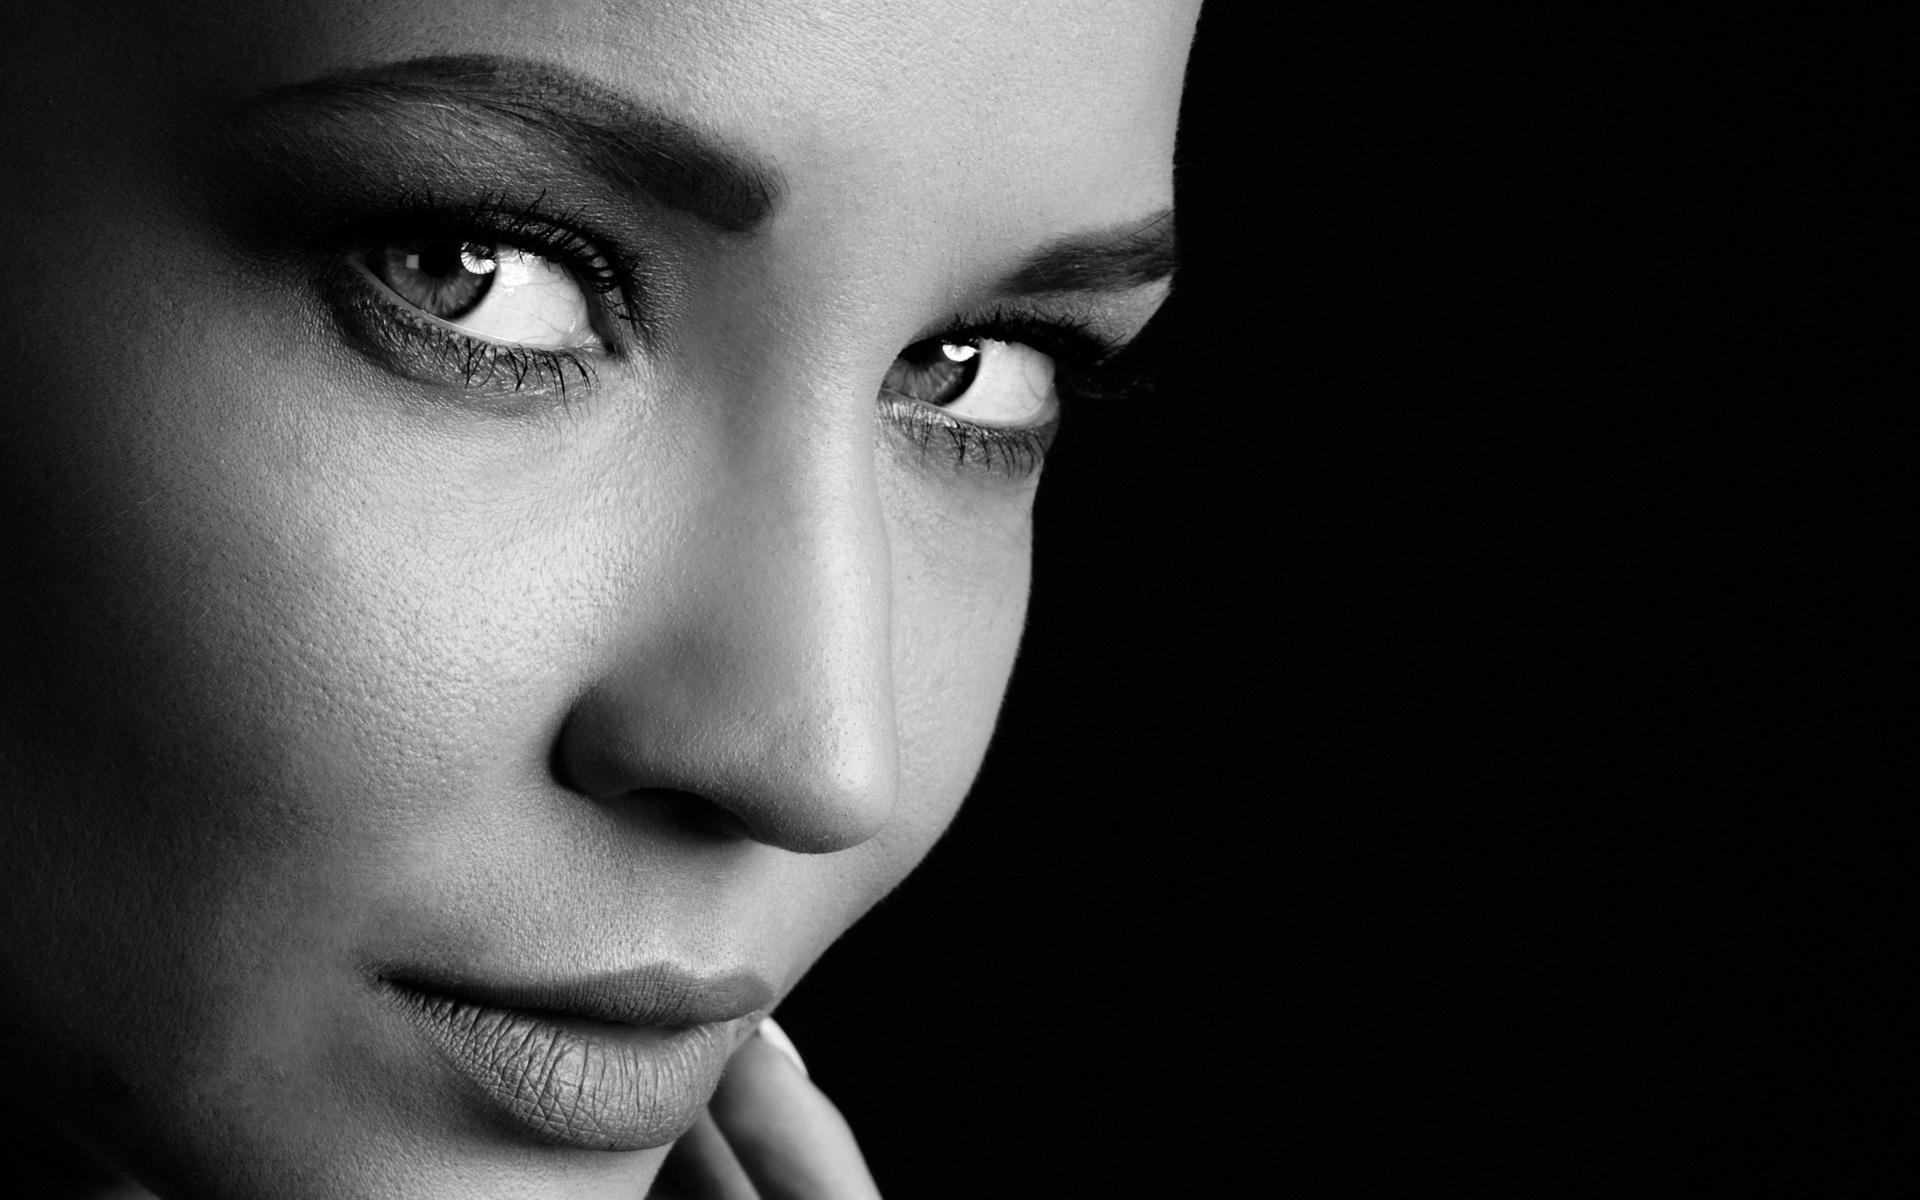 Фото картинки черно белые лицо